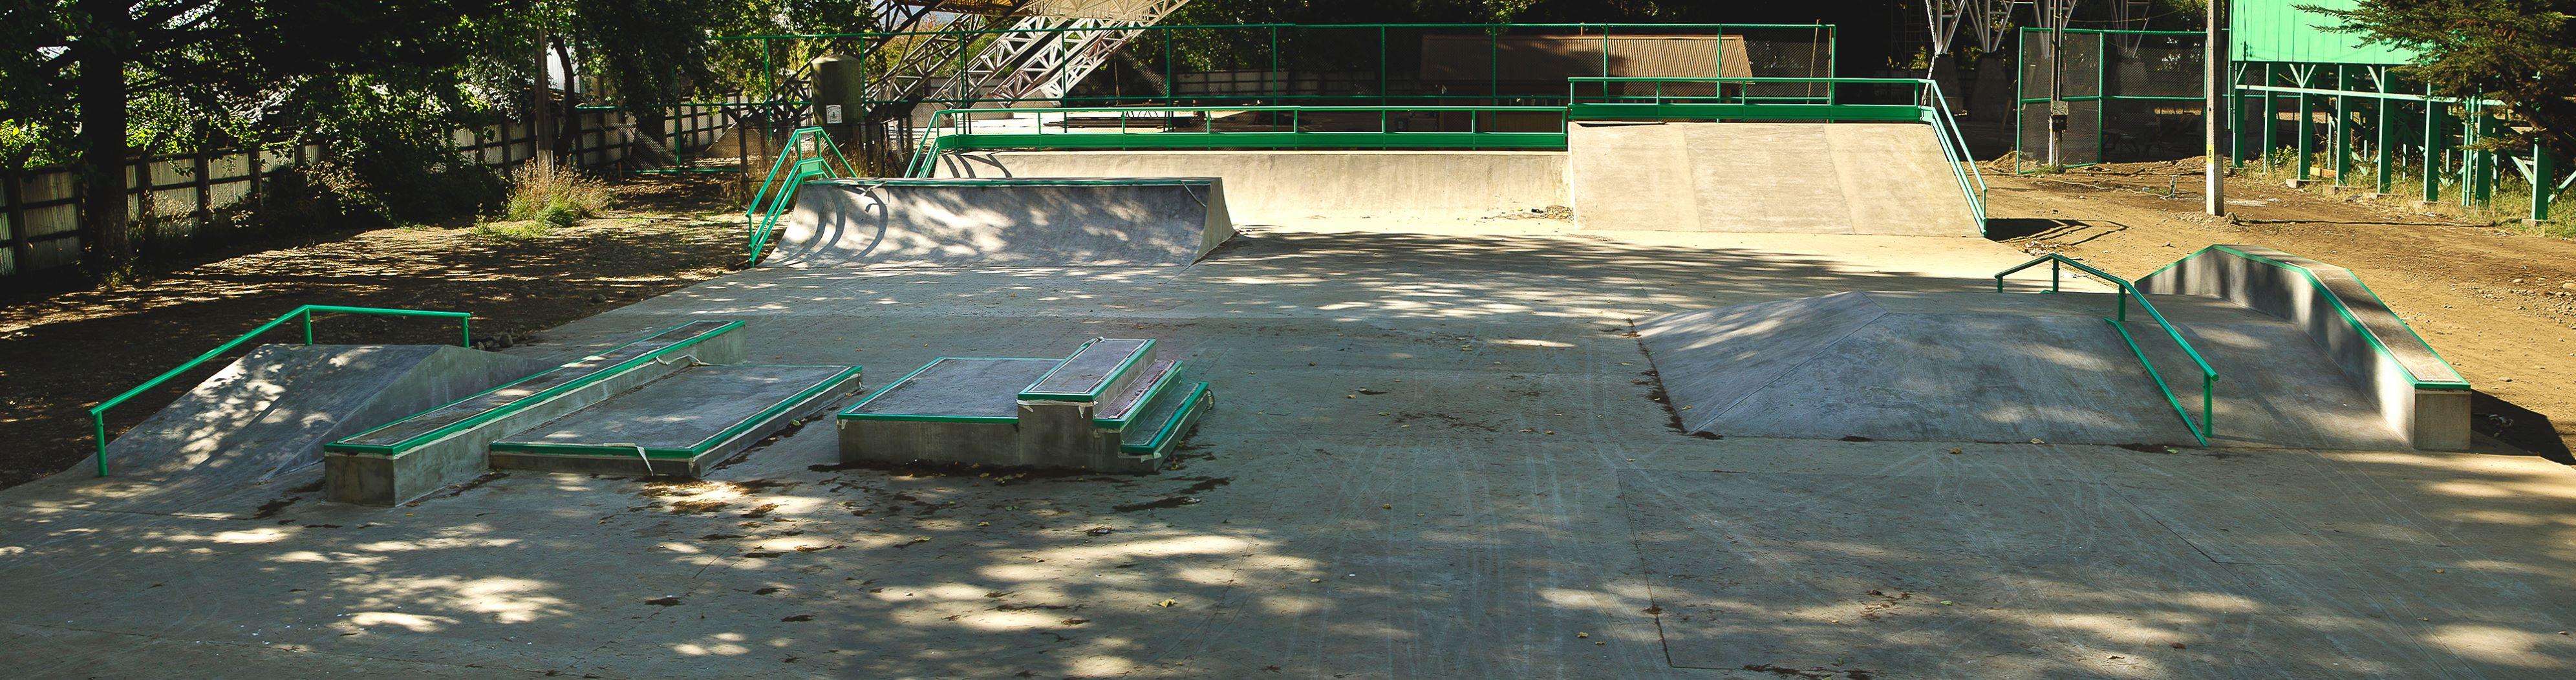 skatepark paillaco 2